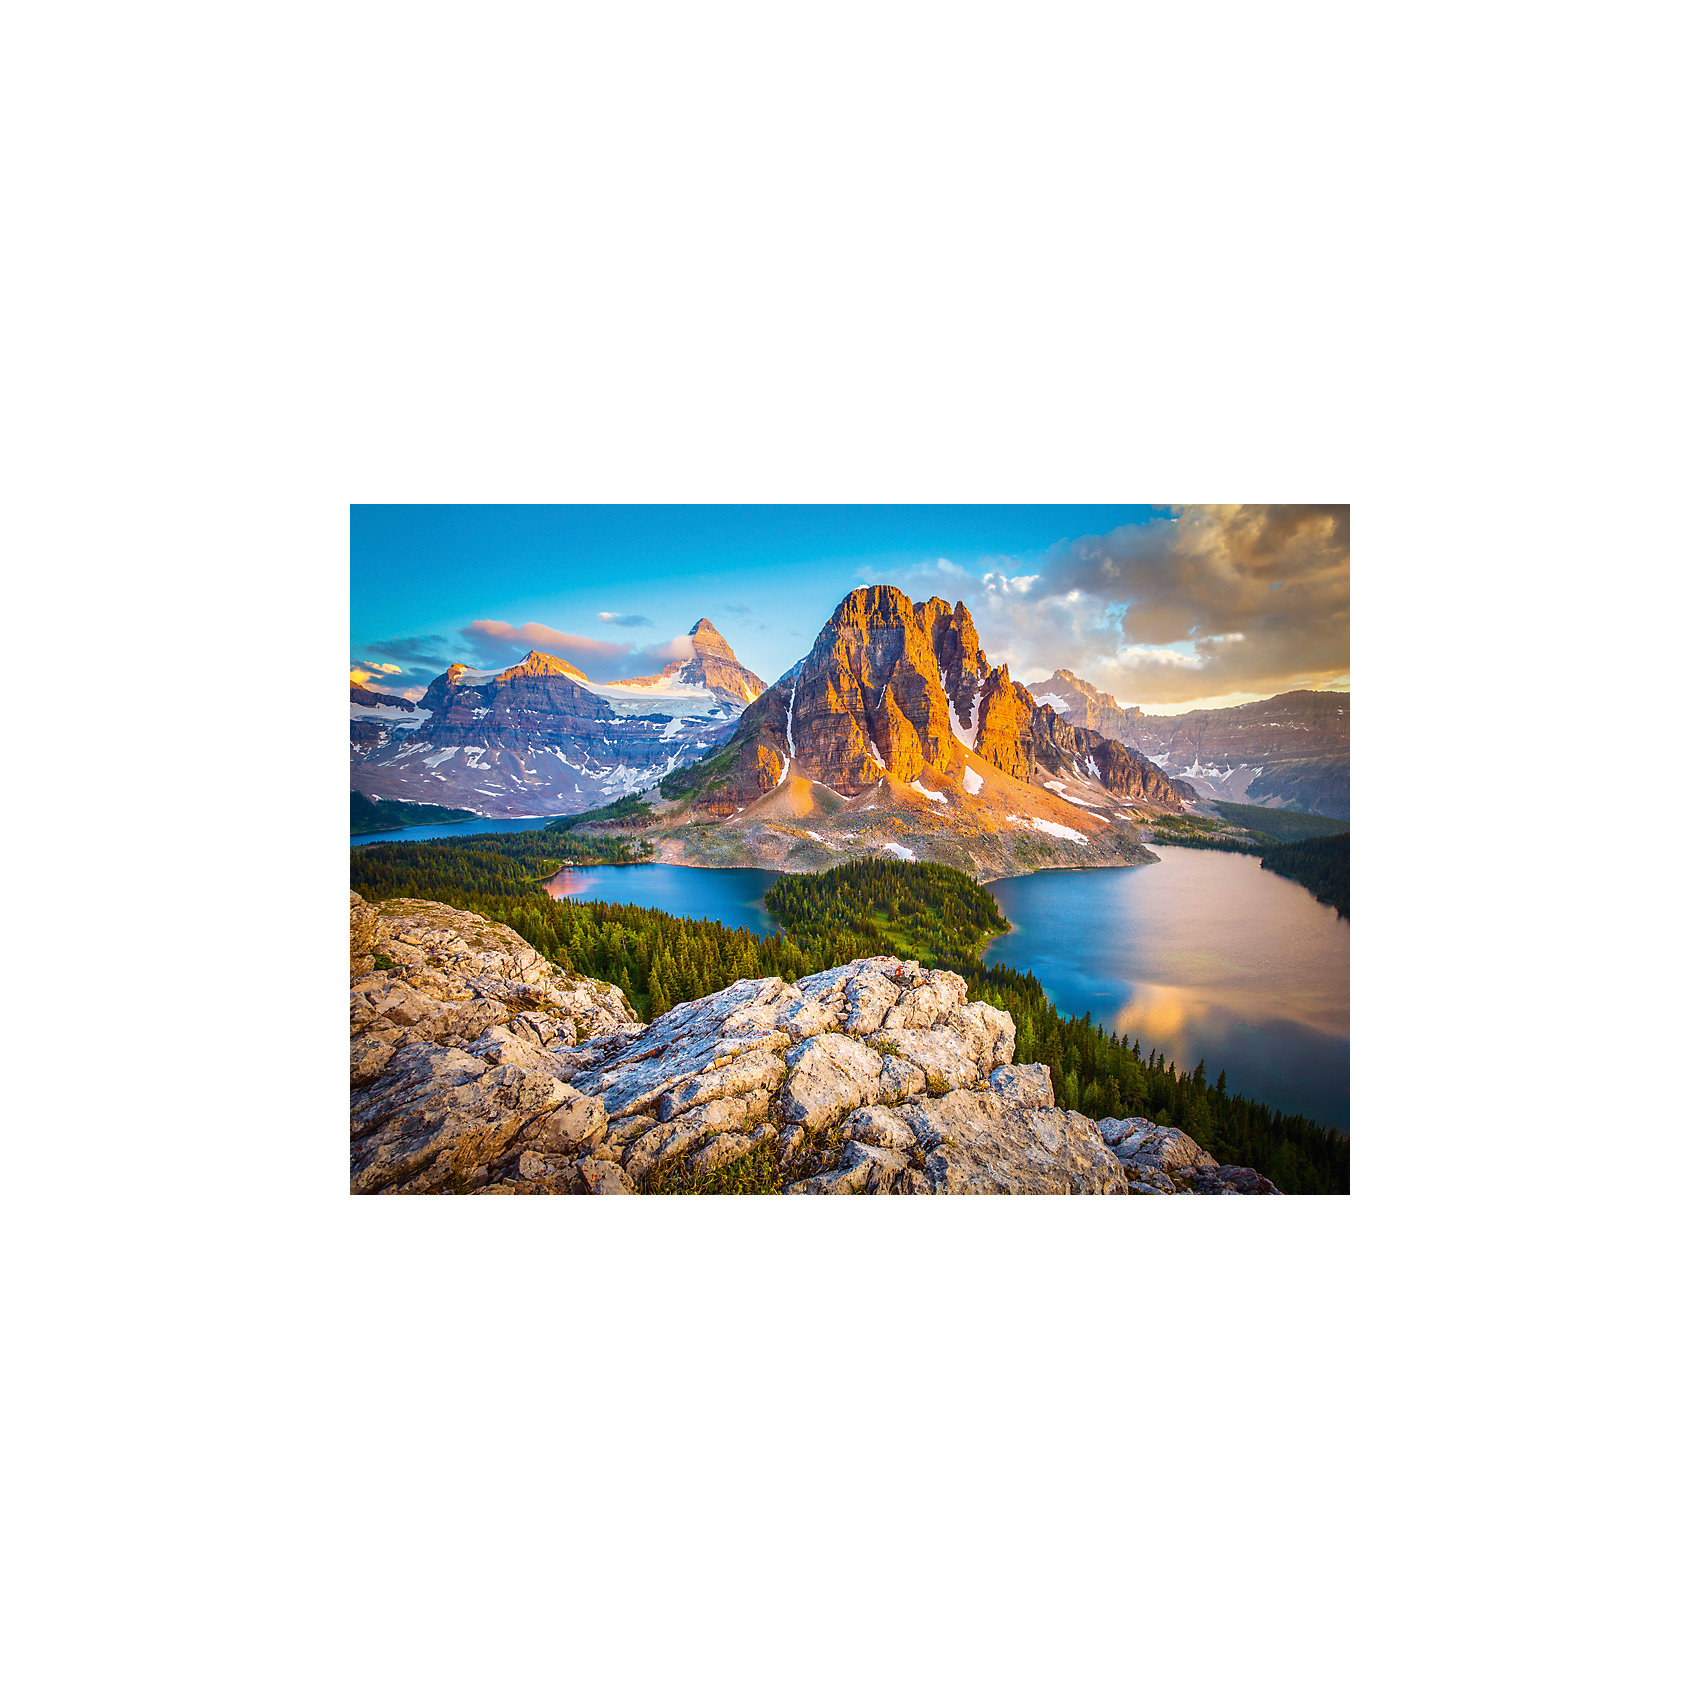 Castorland Пазл Национальный парк, Канада, 1000 деталей, Castorland castorland пазл пагода 1000 деталей castorland